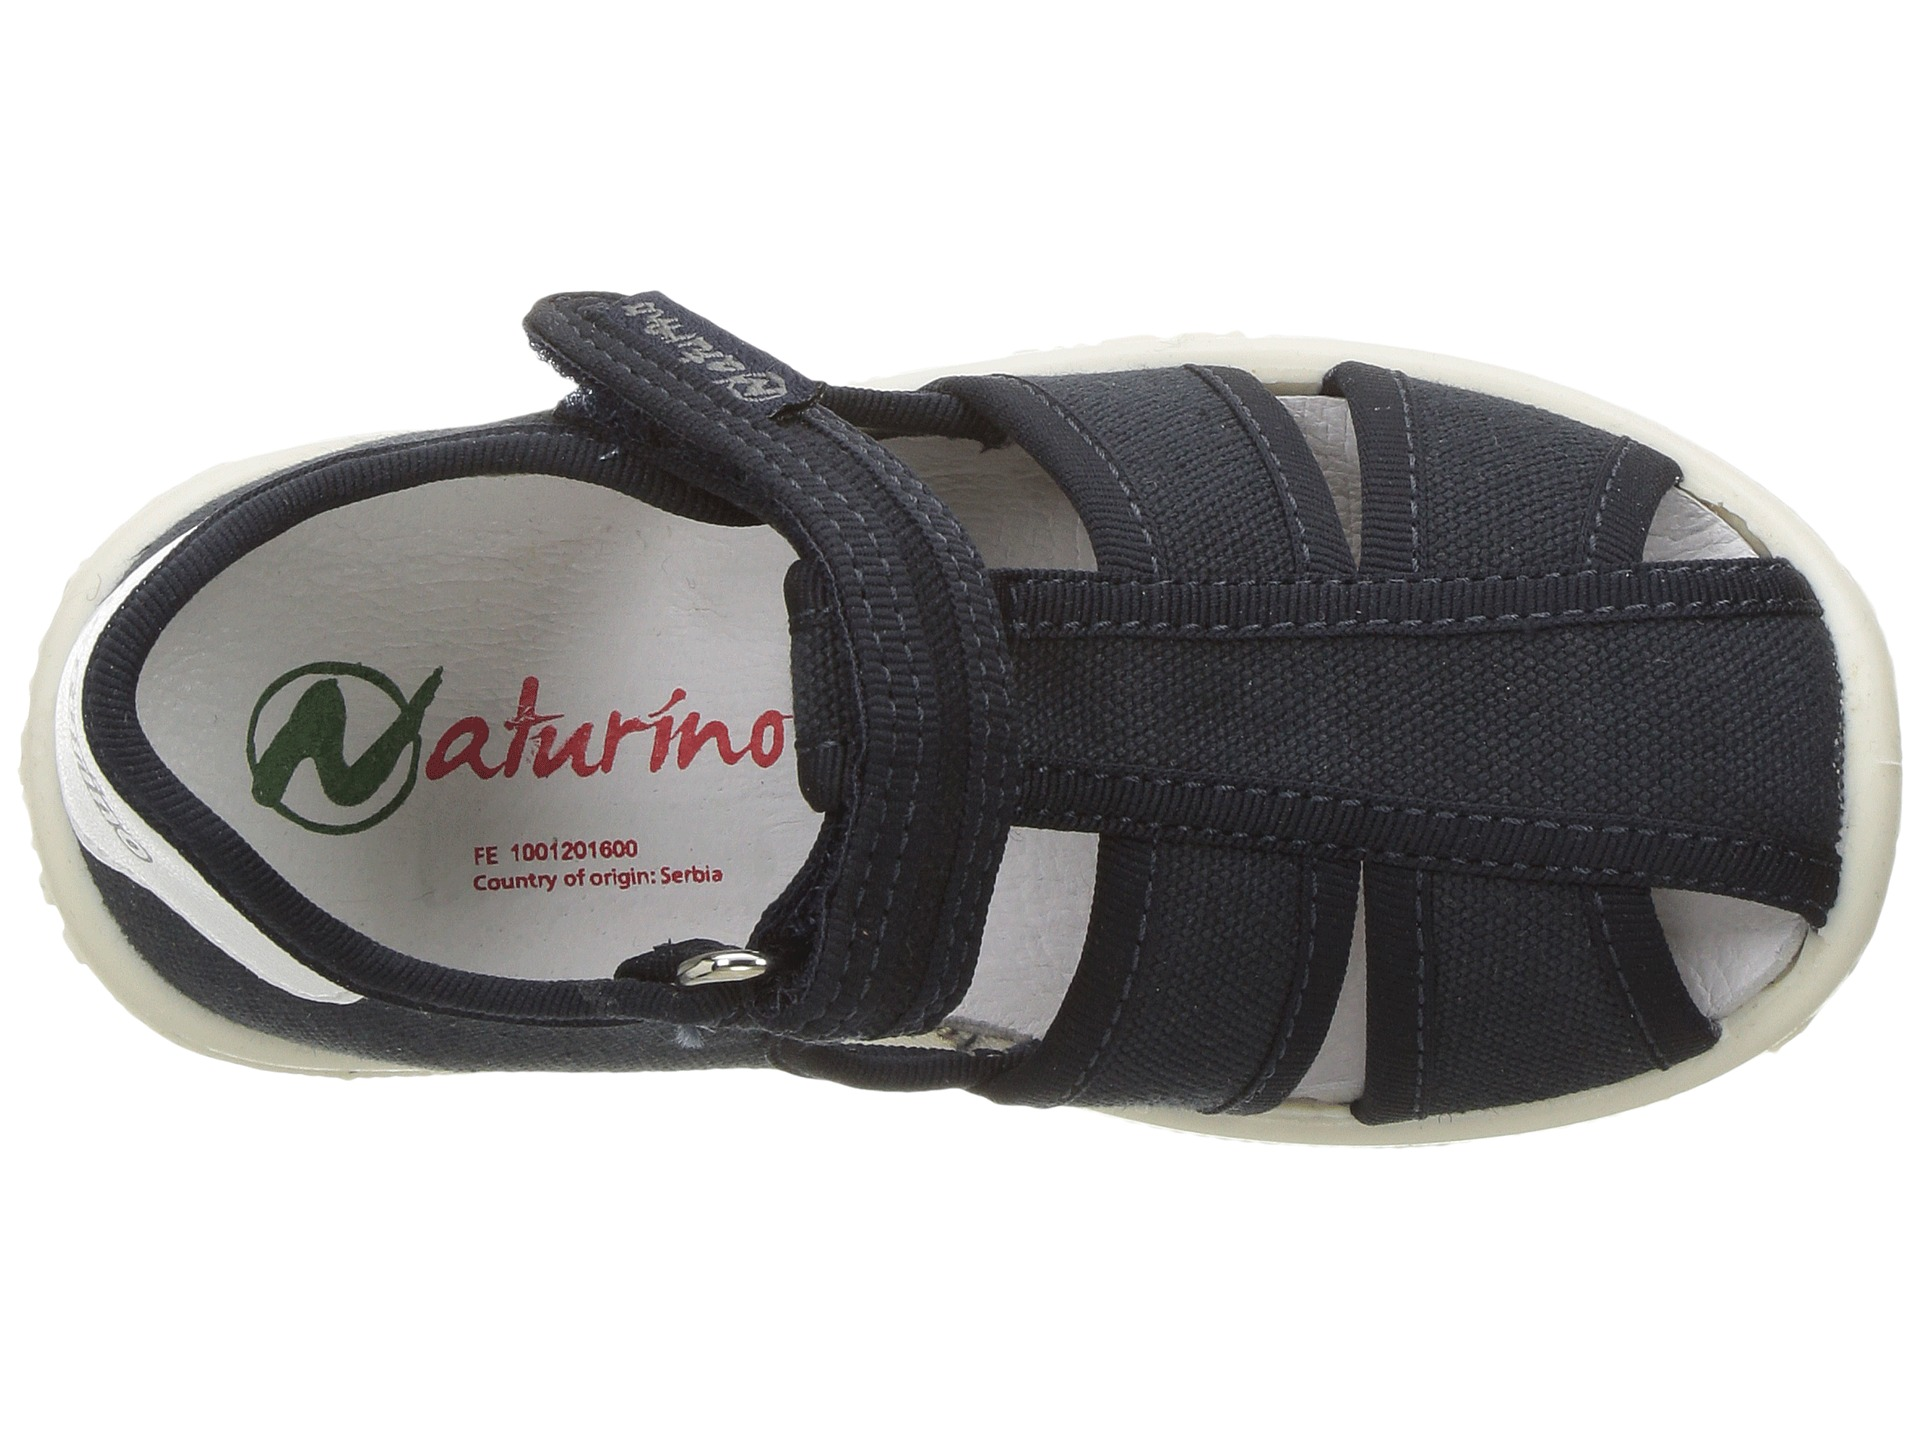 Naturino Toddler Shoes Reviews